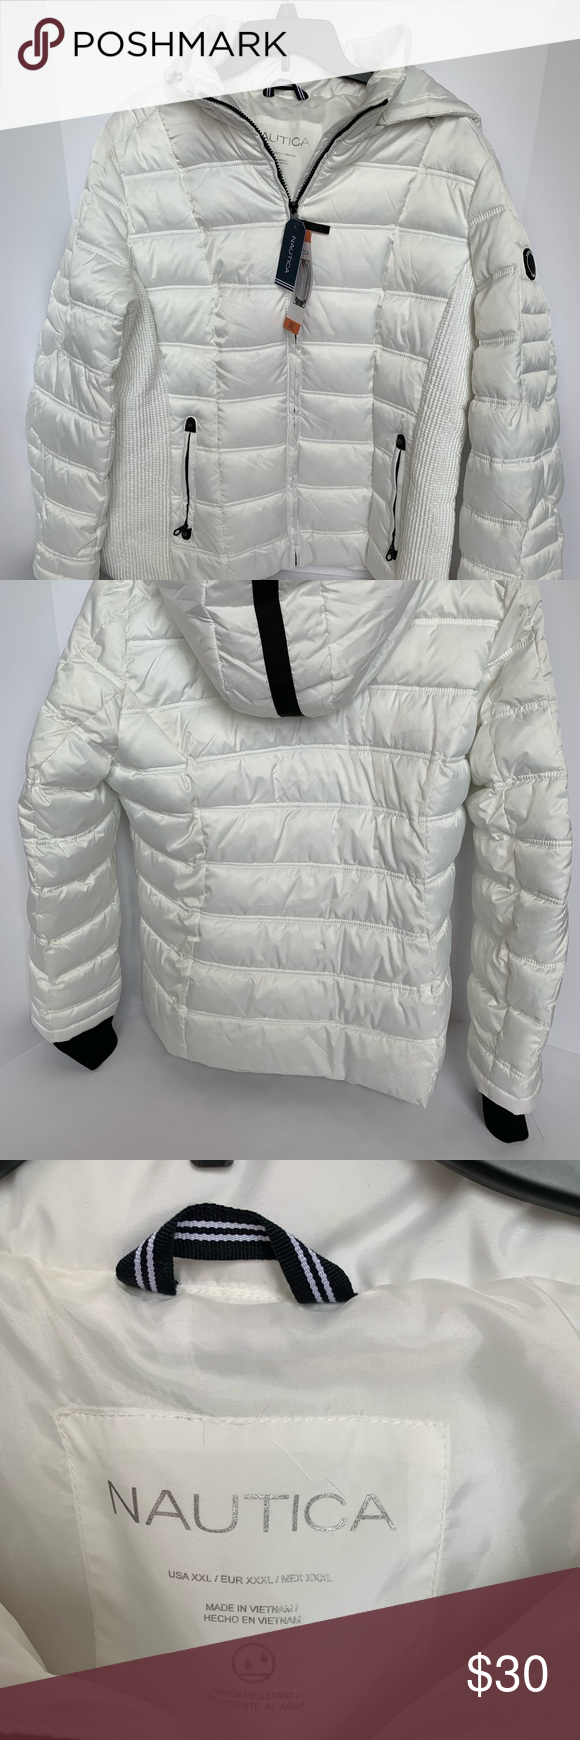 Nautica Waterproof Puffer Jacket Runs Smaller Fashion Design Clothes Design Fashion [ 1740 x 580 Pixel ]